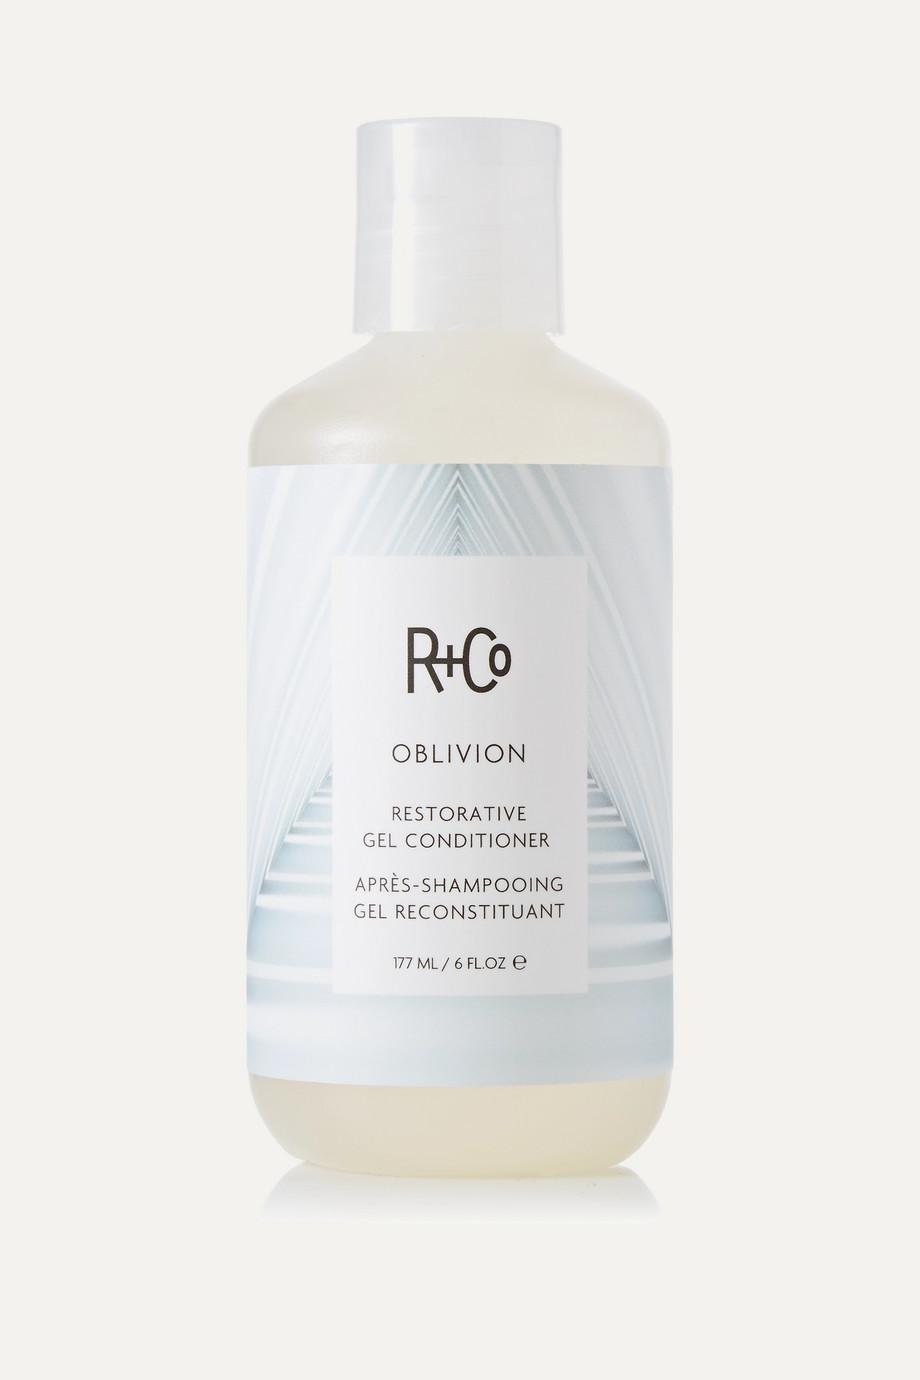 R+Co Oblivion Restorative Gel Conditioner, 177ml